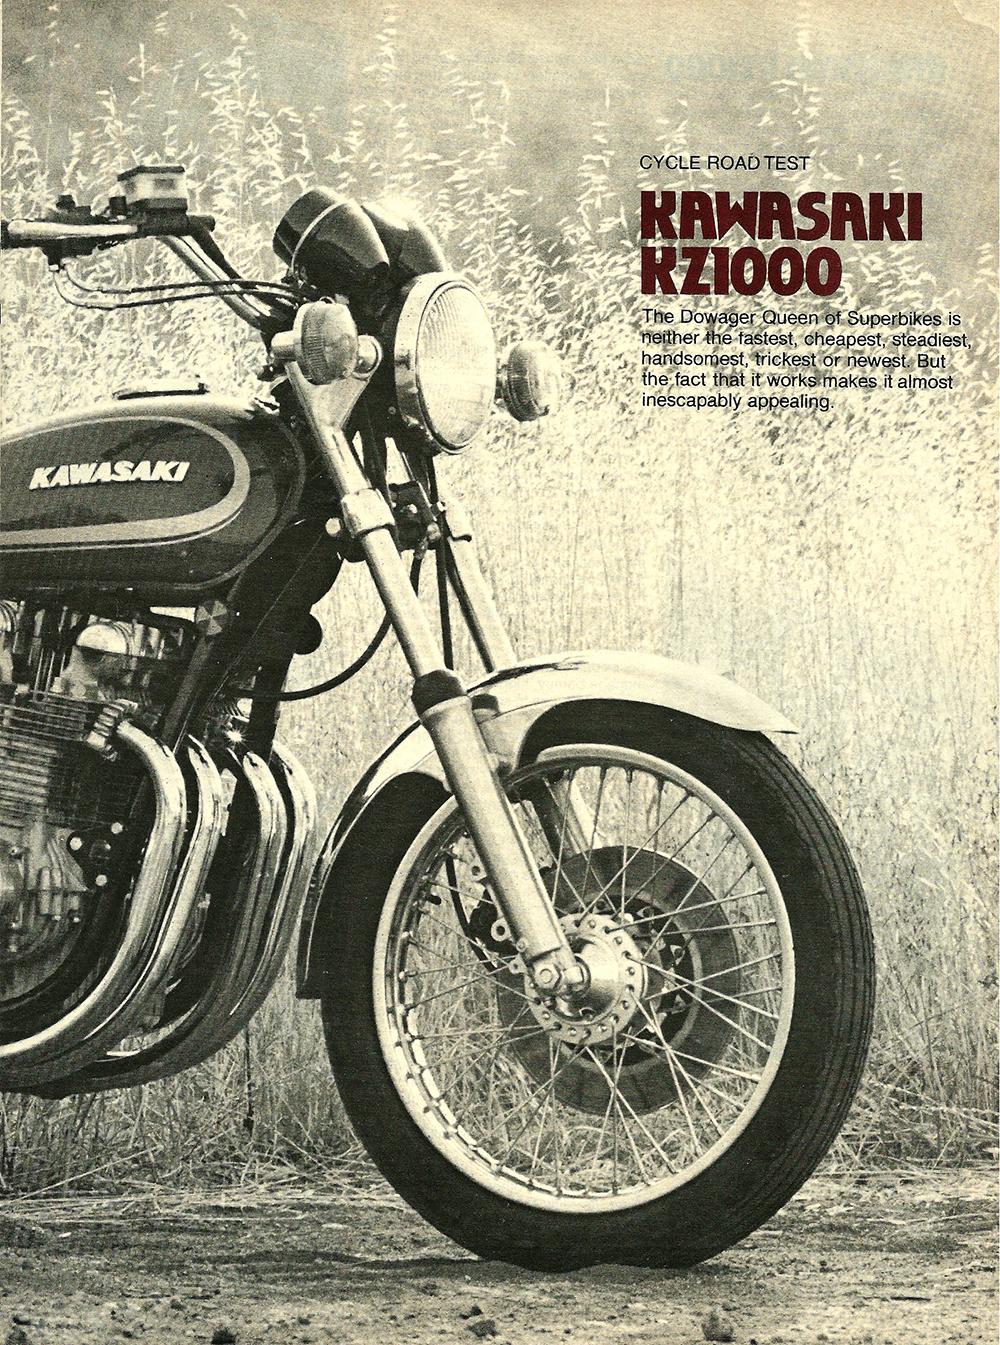 1978 Kawasaki KZ1000 road test 02.jpg